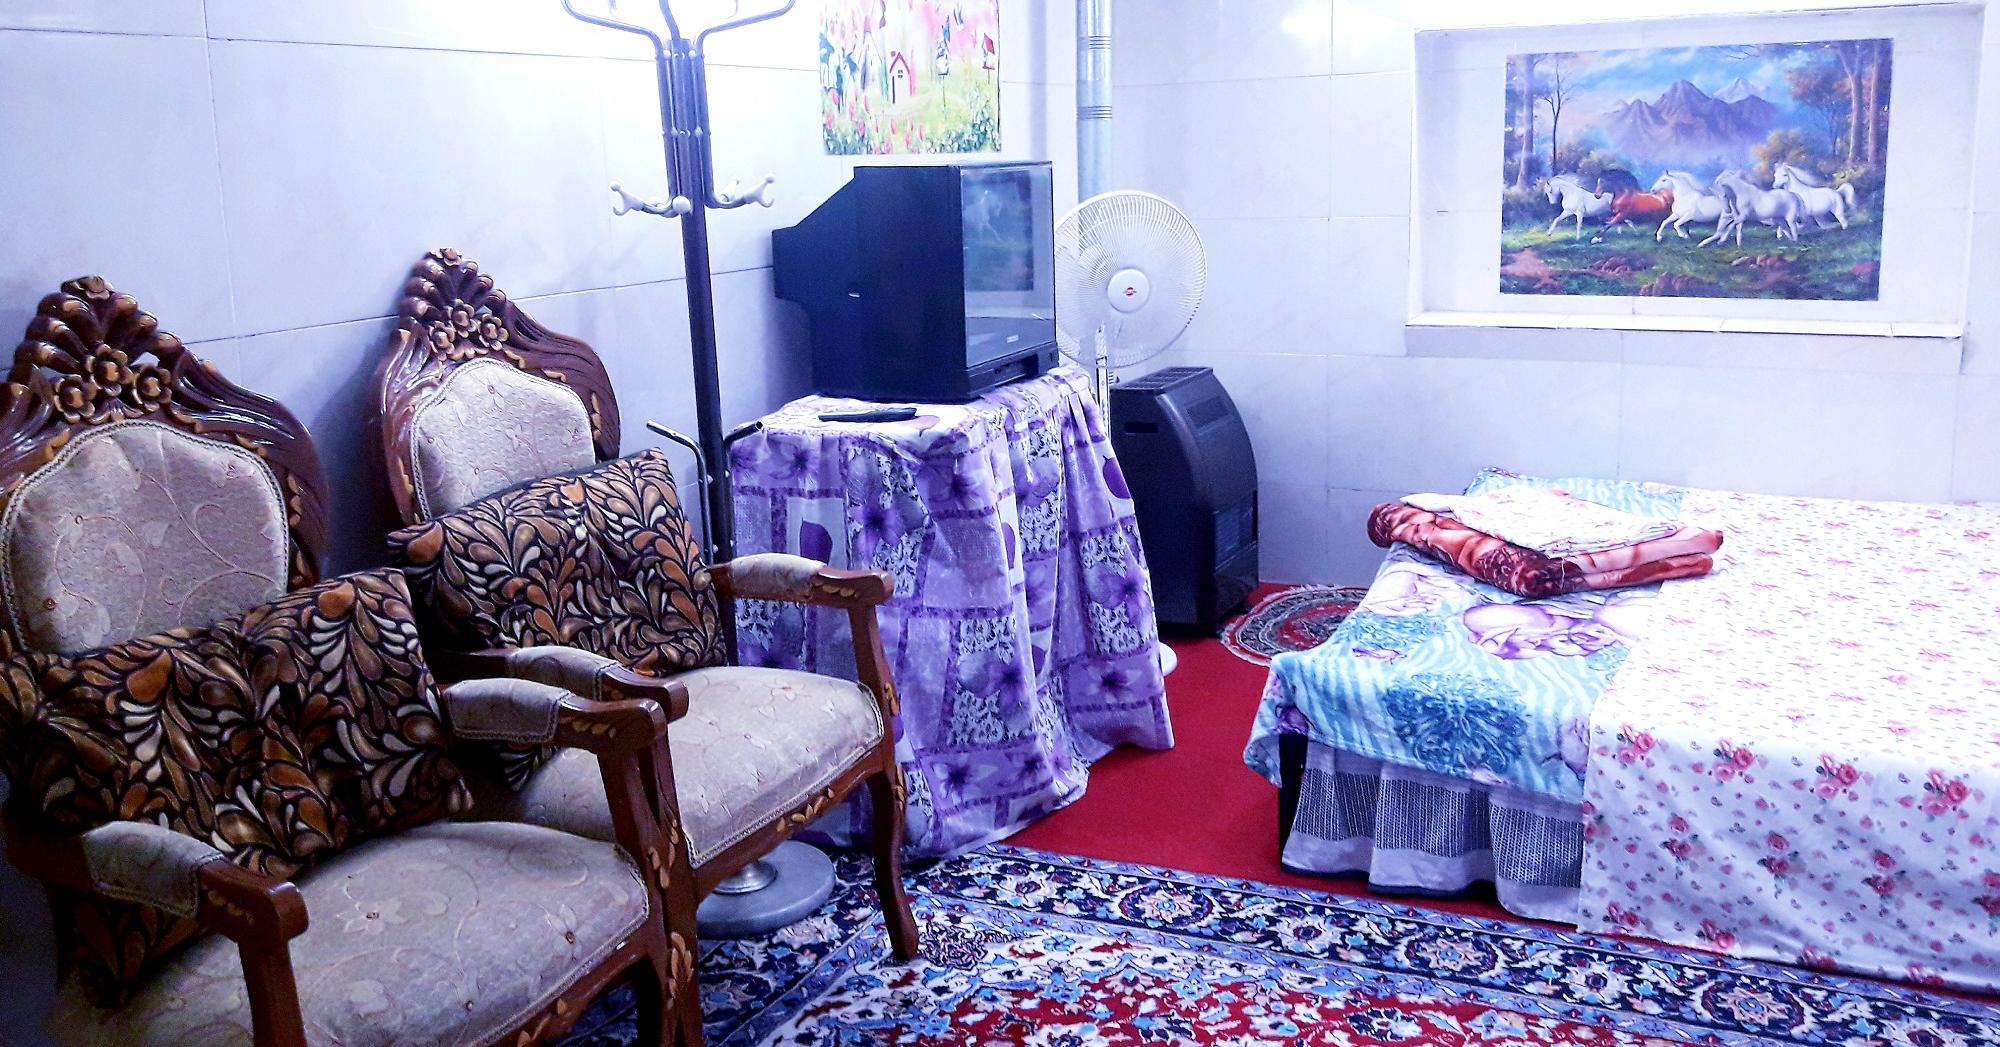 townee سوییت مبله در میدان لاله اصفهان